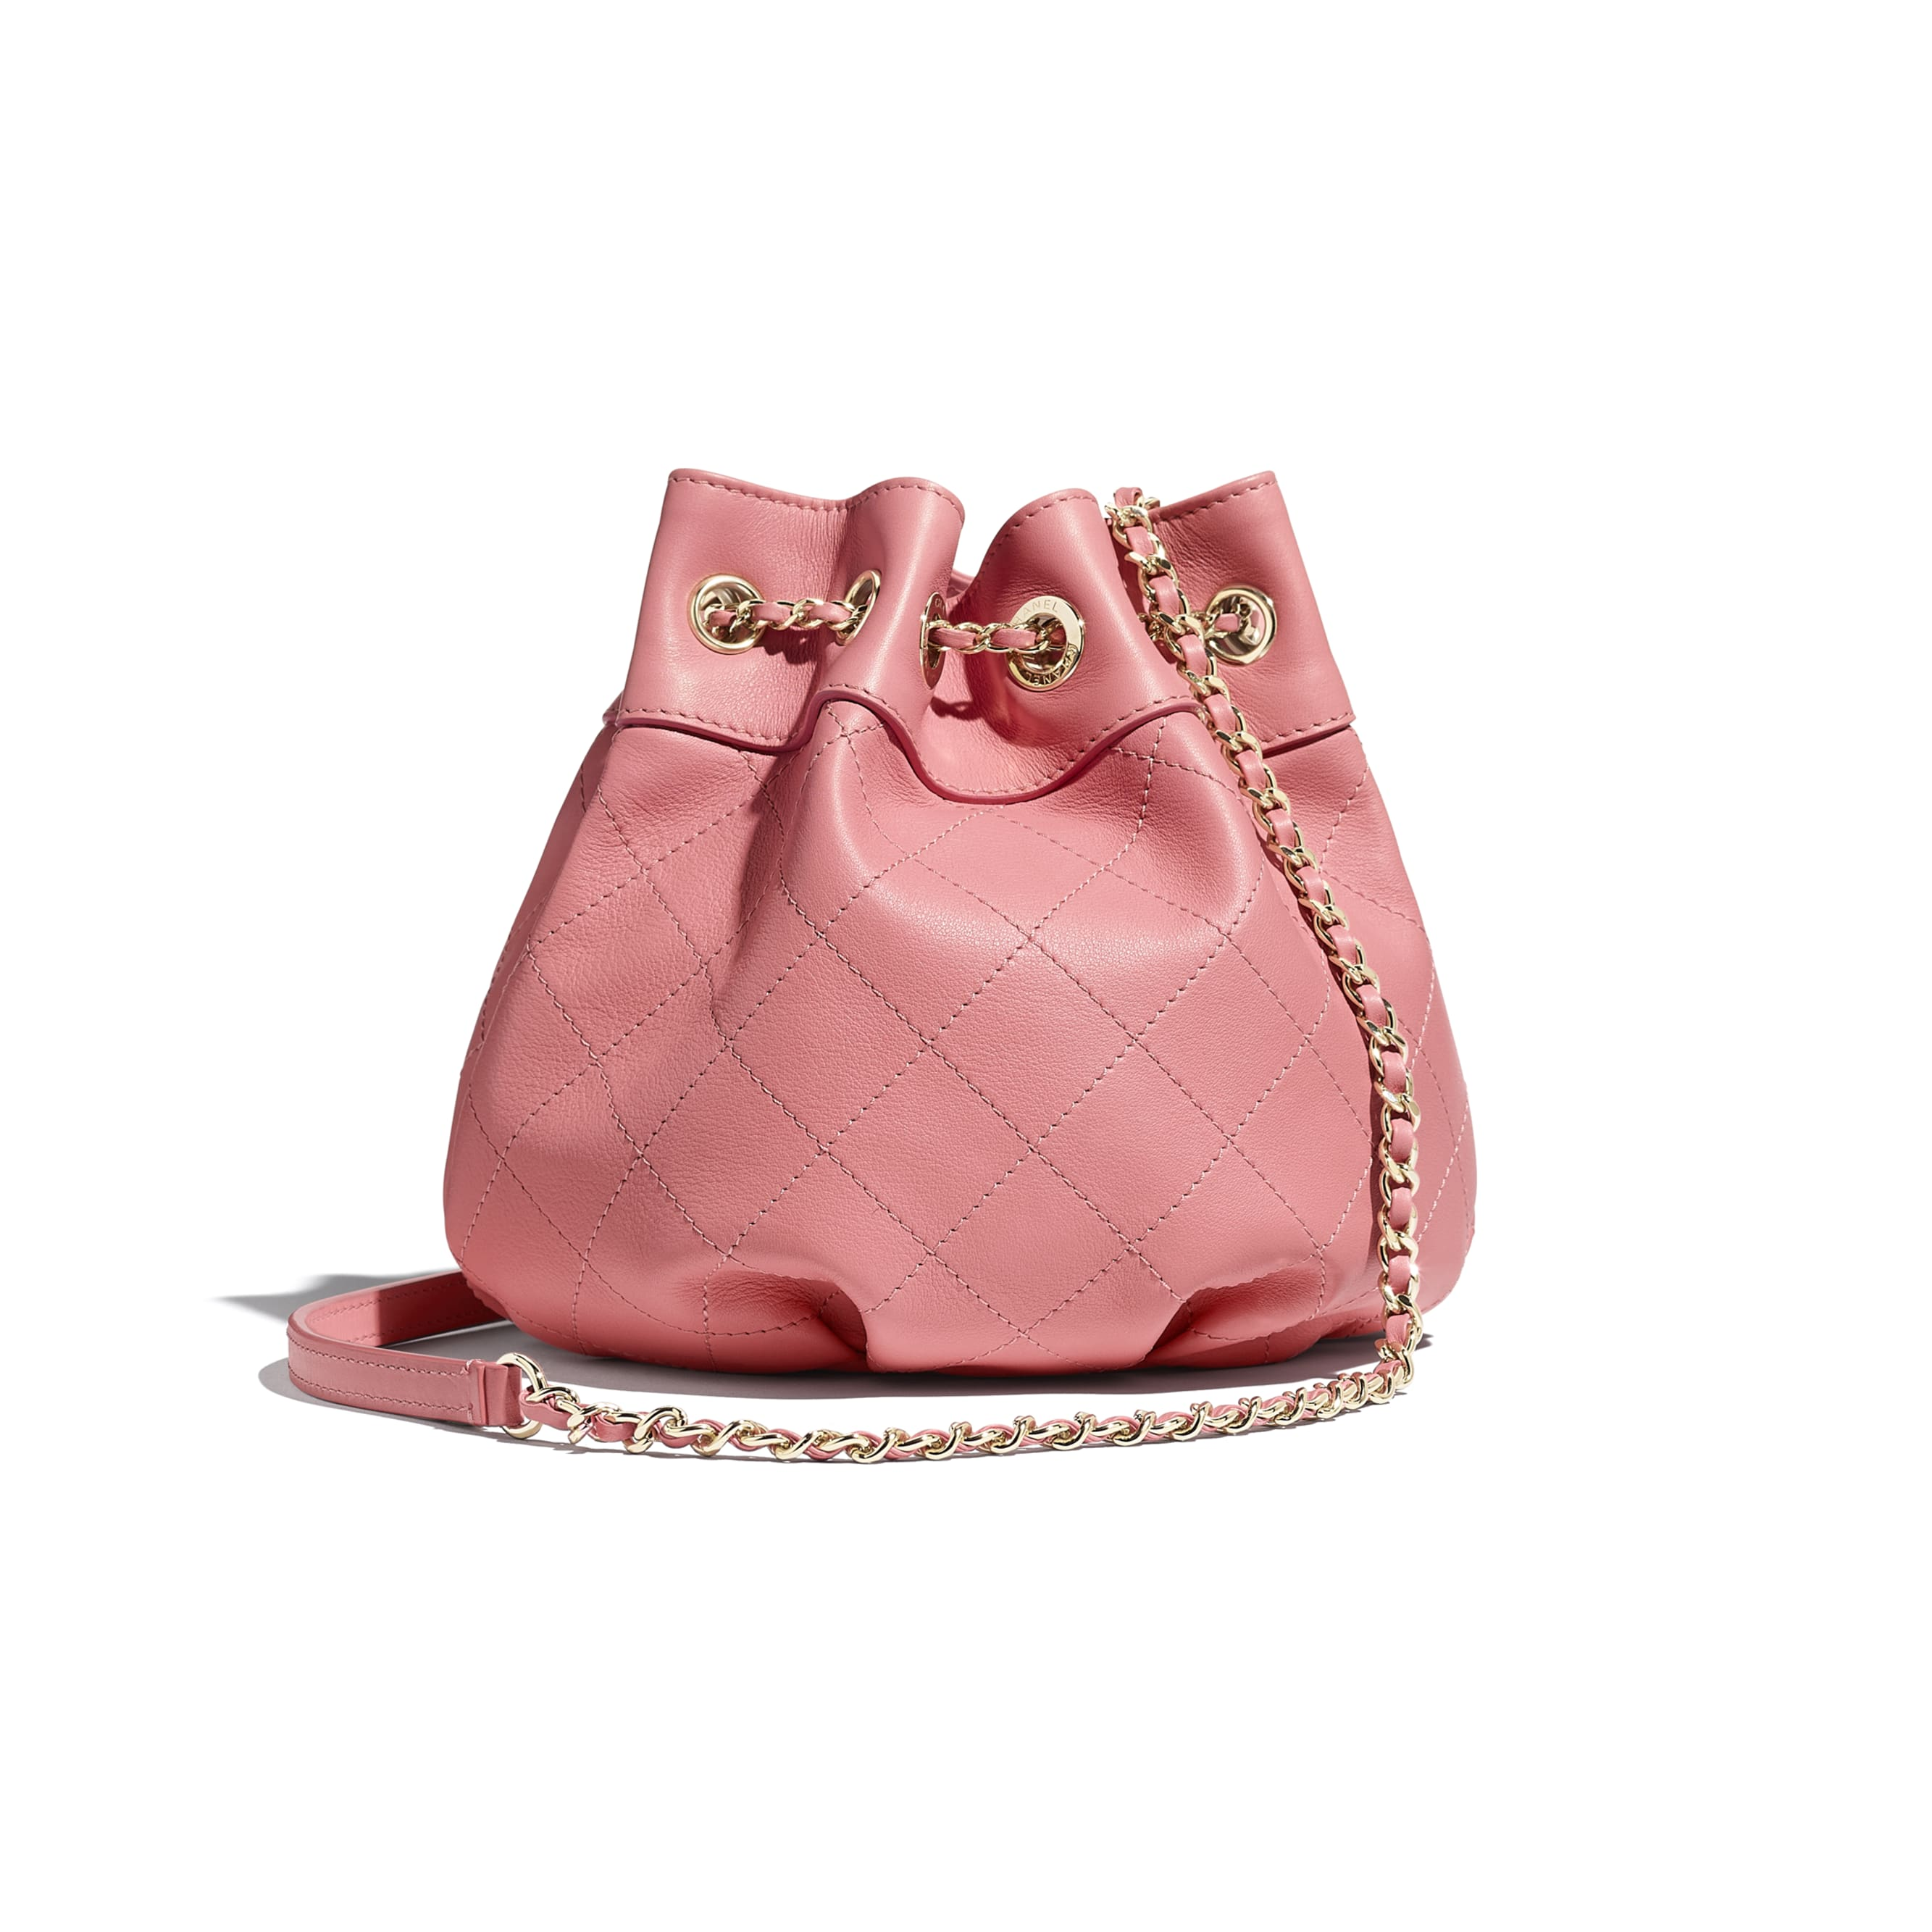 Small Drawstring Bag - Pink - Calfskin & Gold-Tone Metal - CHANEL - Alternative view - see standard sized version